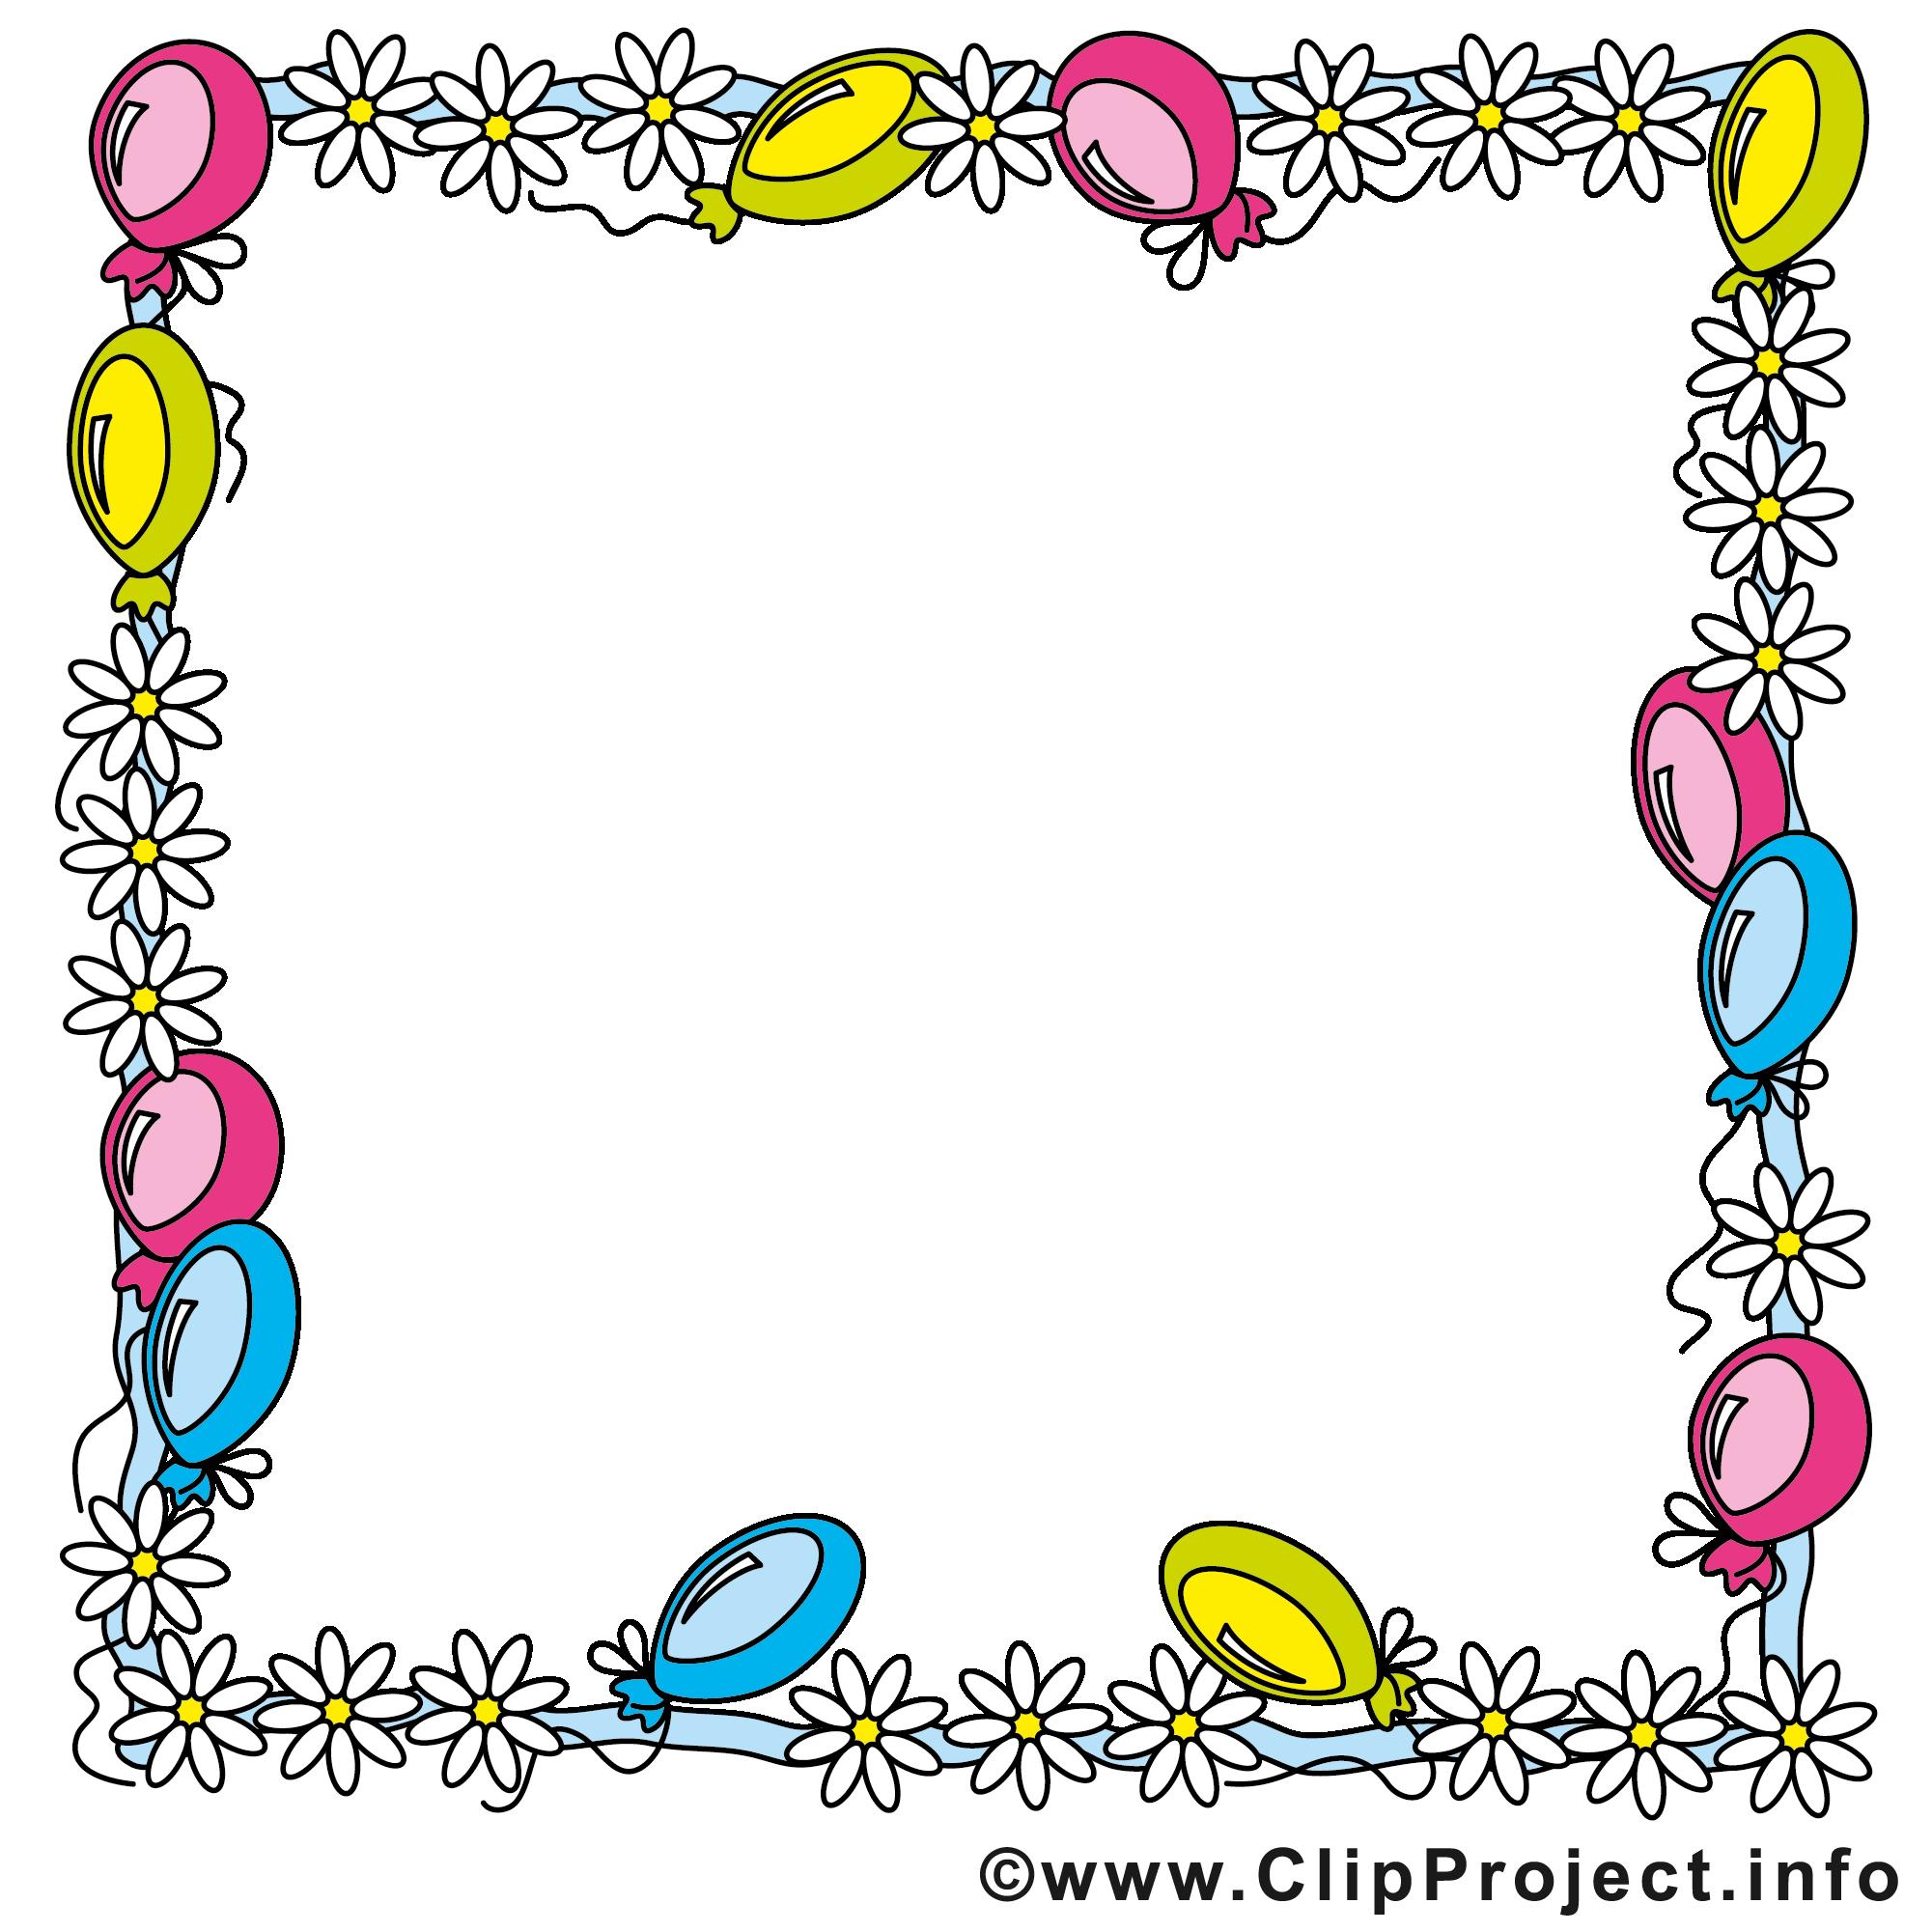 Cliparts geburtstag einladung clip free download Clipart rahmen geburtstag - ClipartFest clip free download